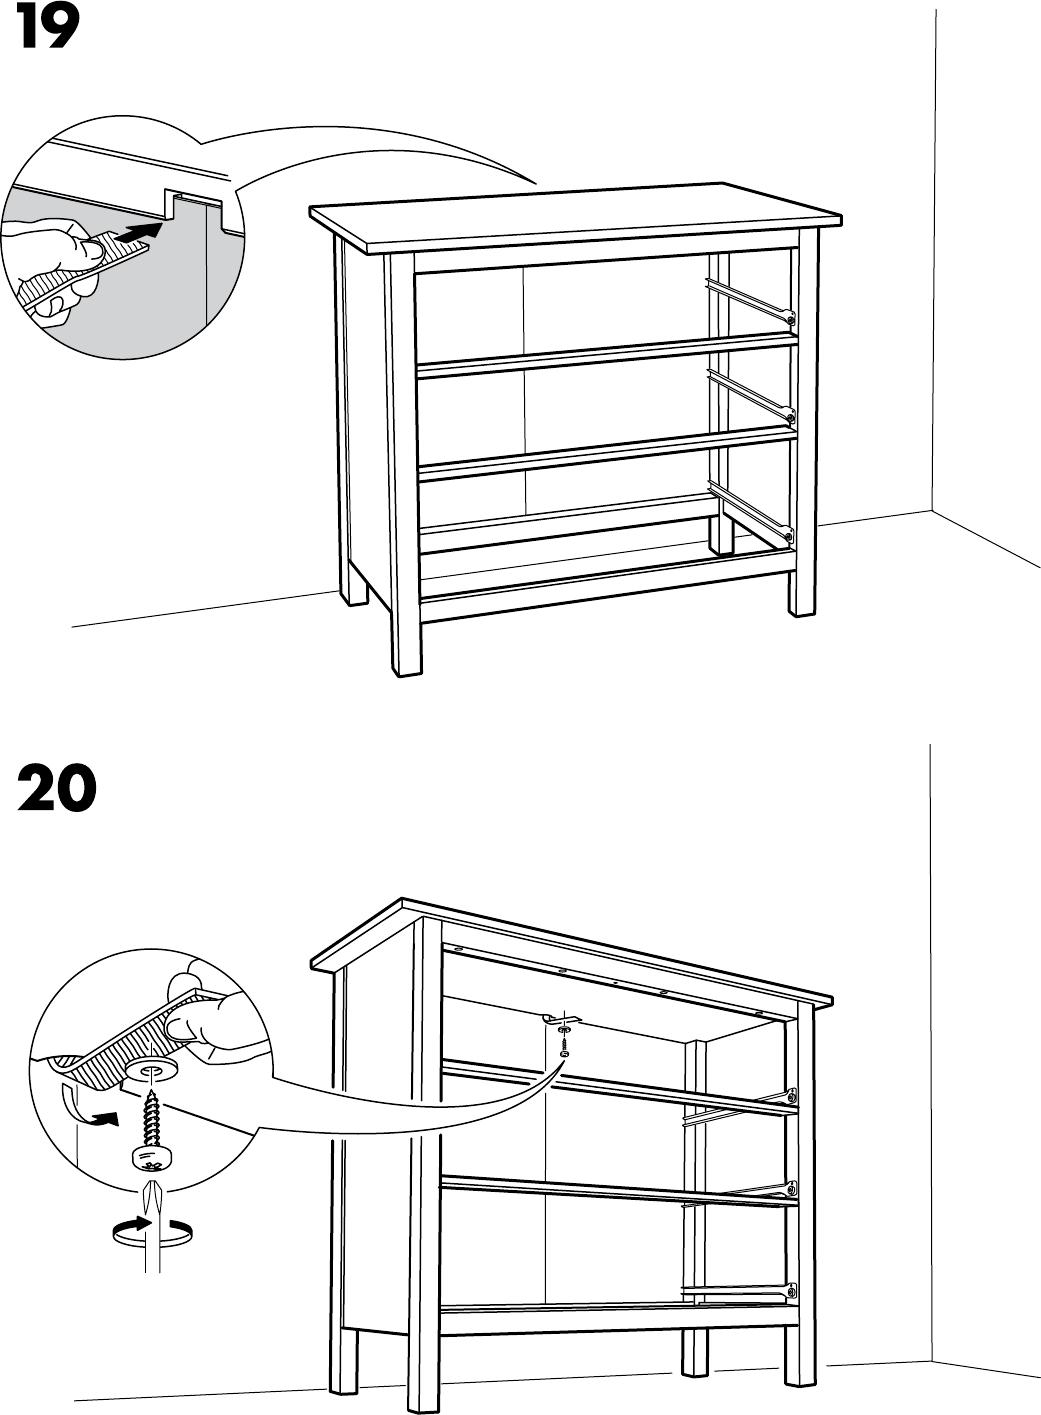 Hemnes Ladekast 3 Laden.Handleiding Ikea Hemnes Ladekast 3 Lades Pagina 17 Van 20